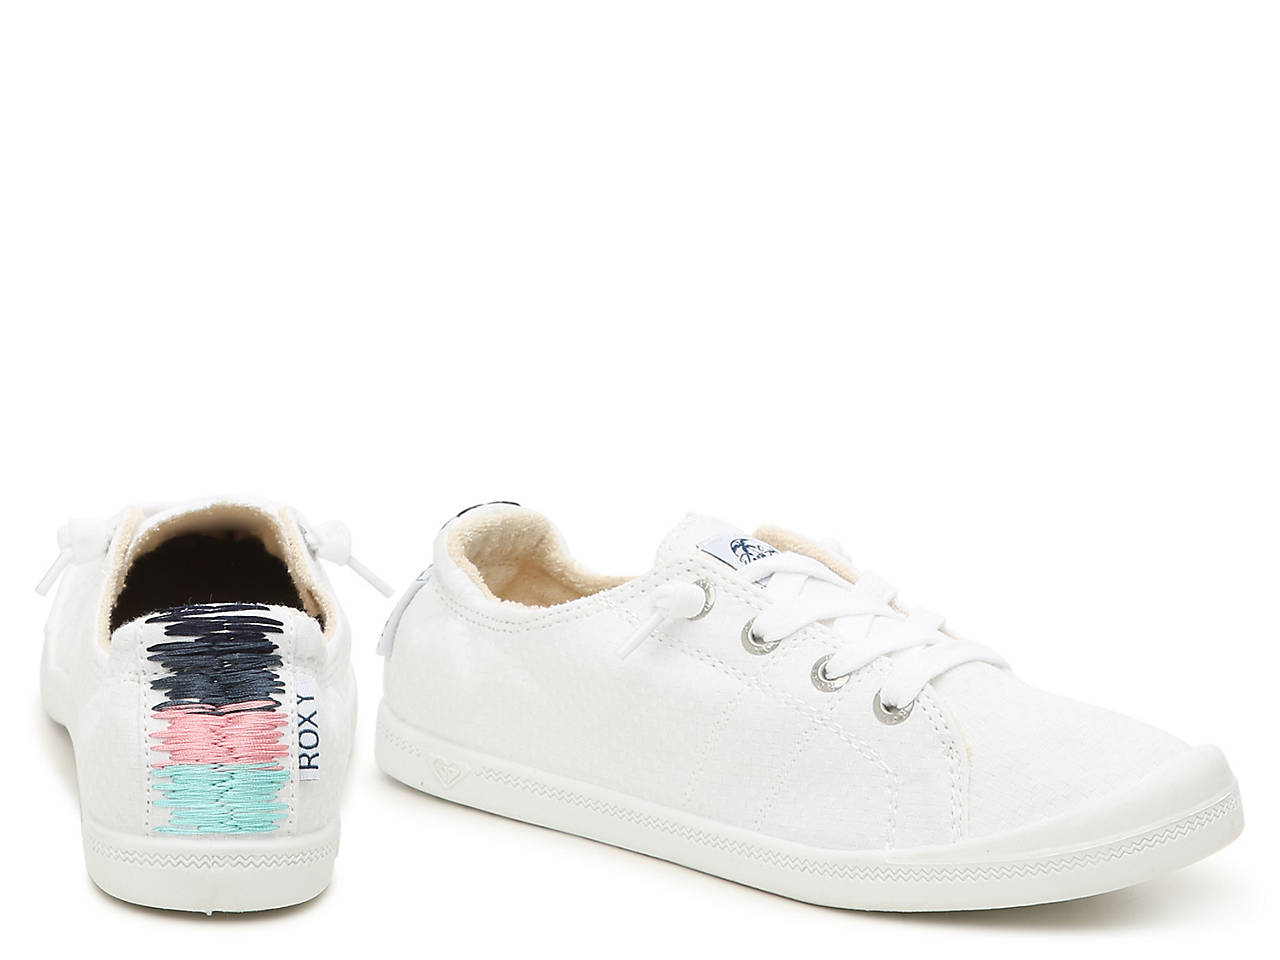 c965995732222 Bayshore III Slip-On Sneaker